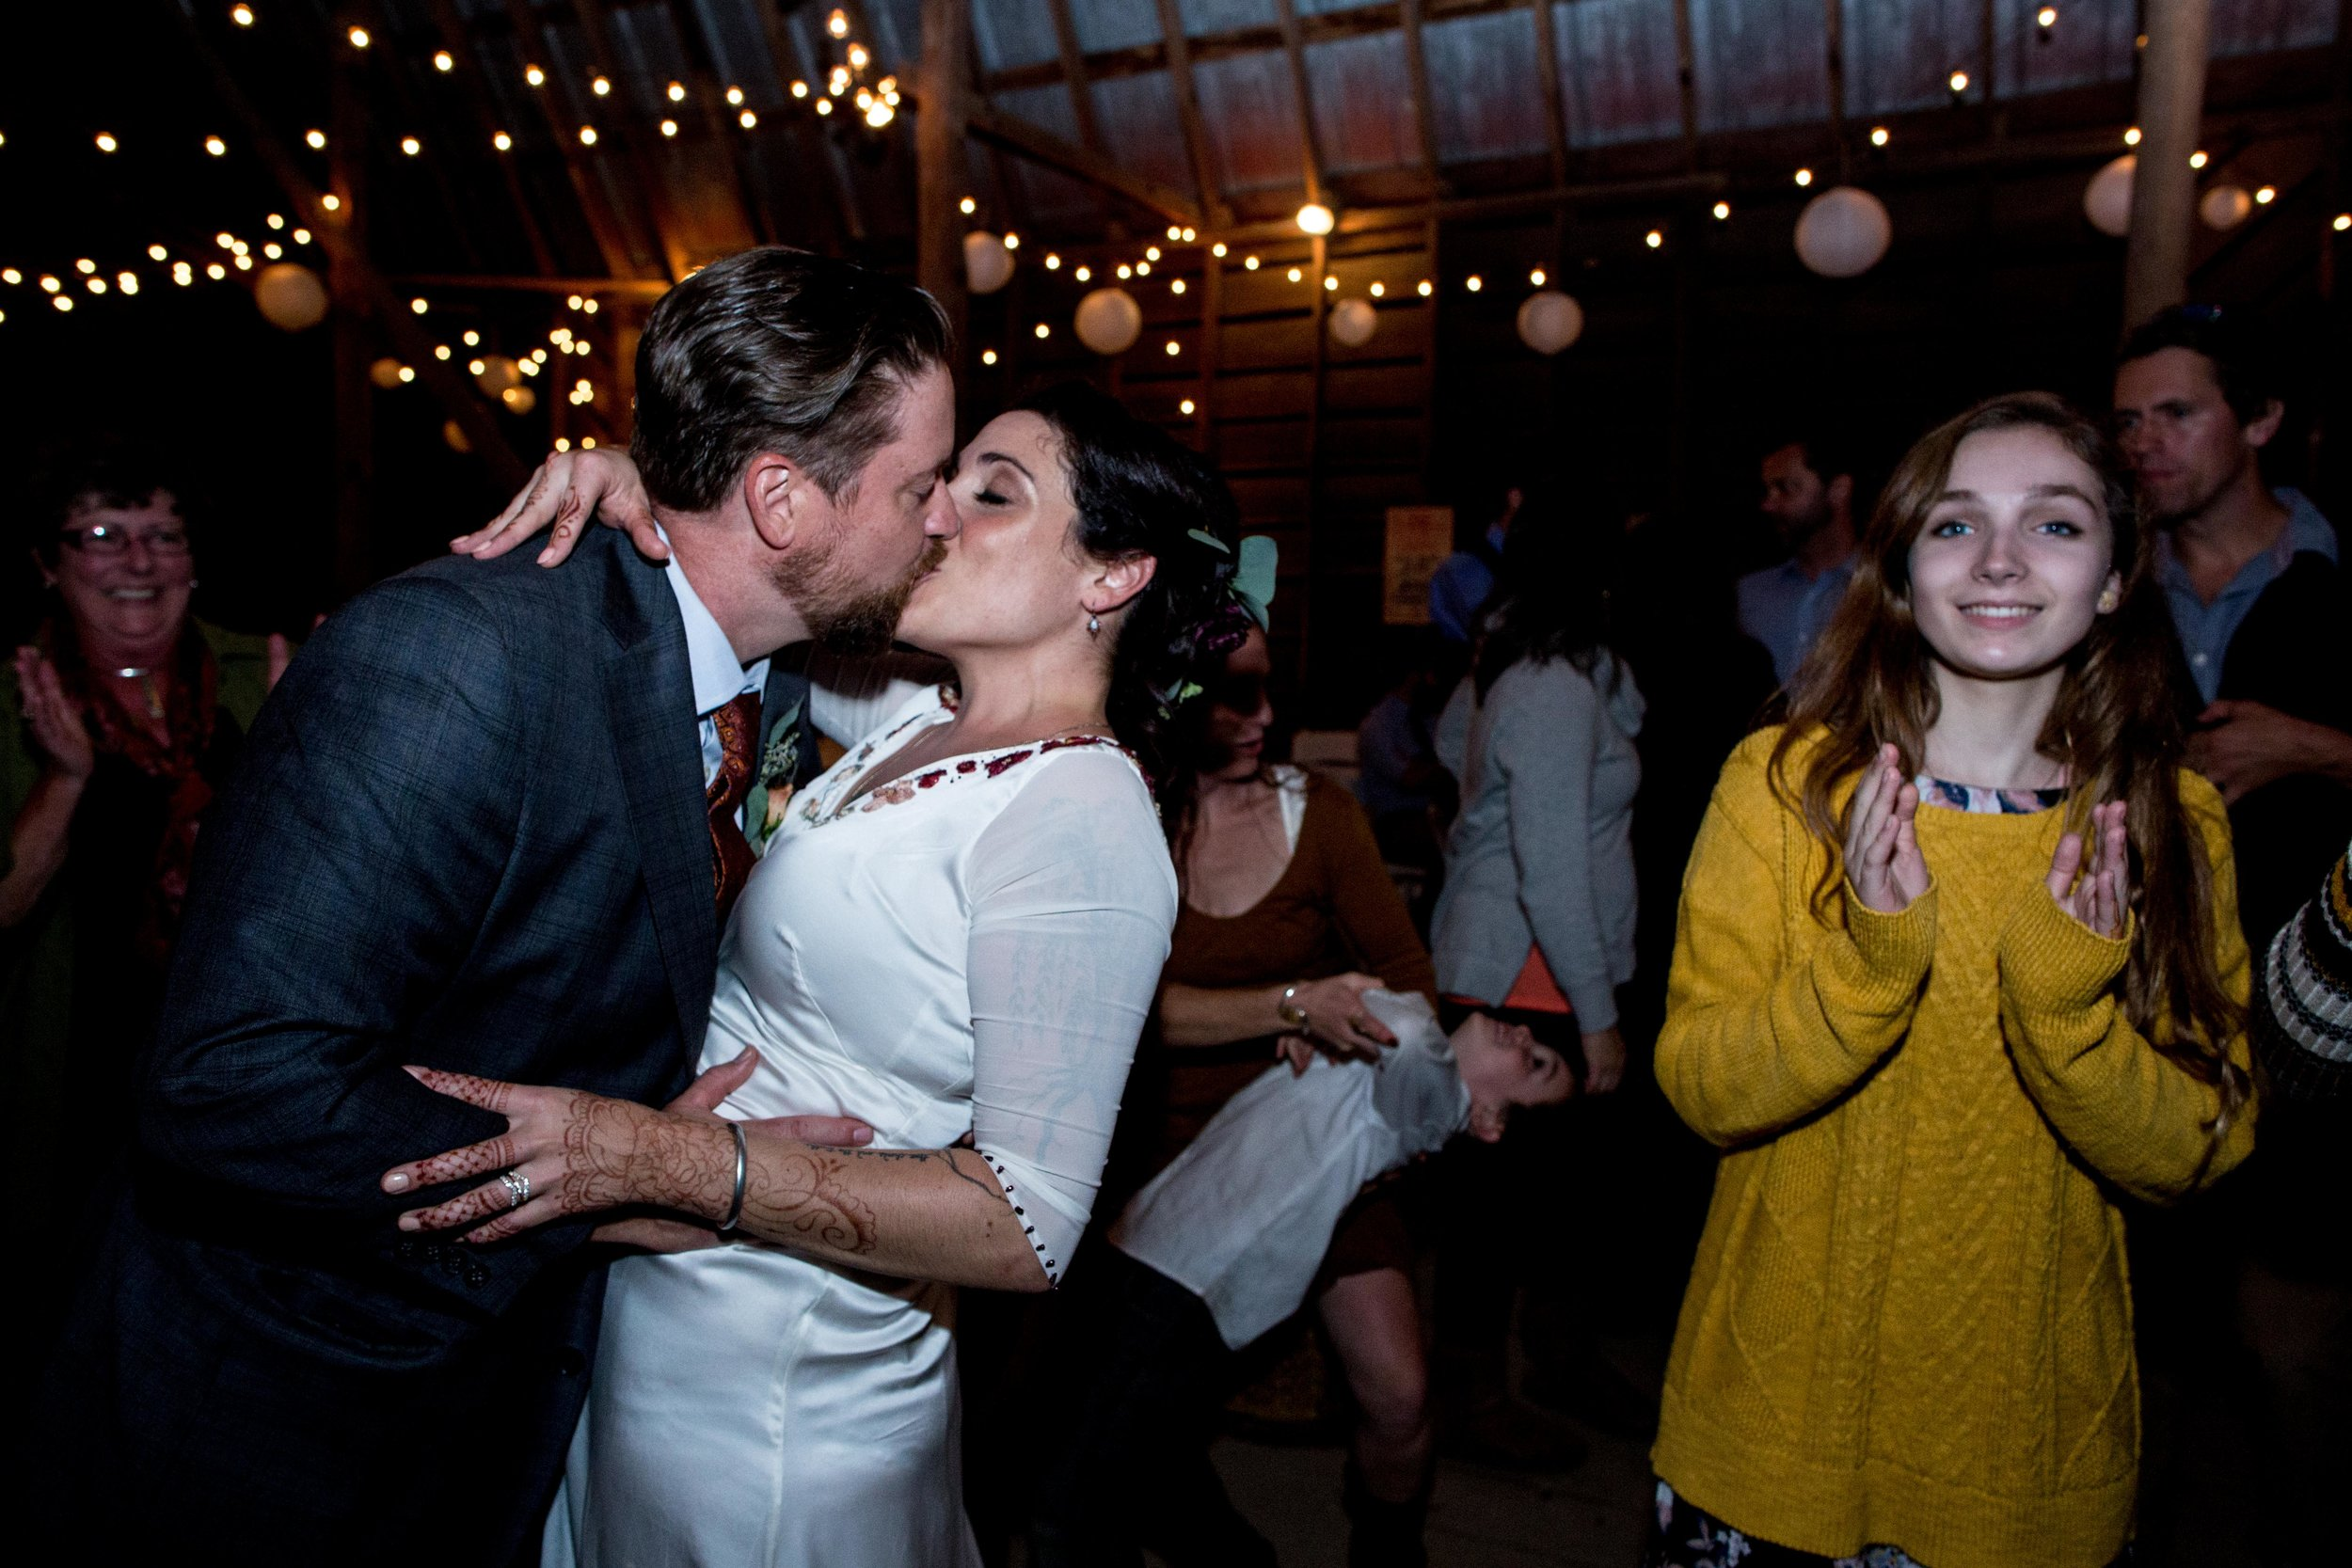 Jane Kramer + Jason Sandford Ashevegas wedding best photographer WNC -79.jpg